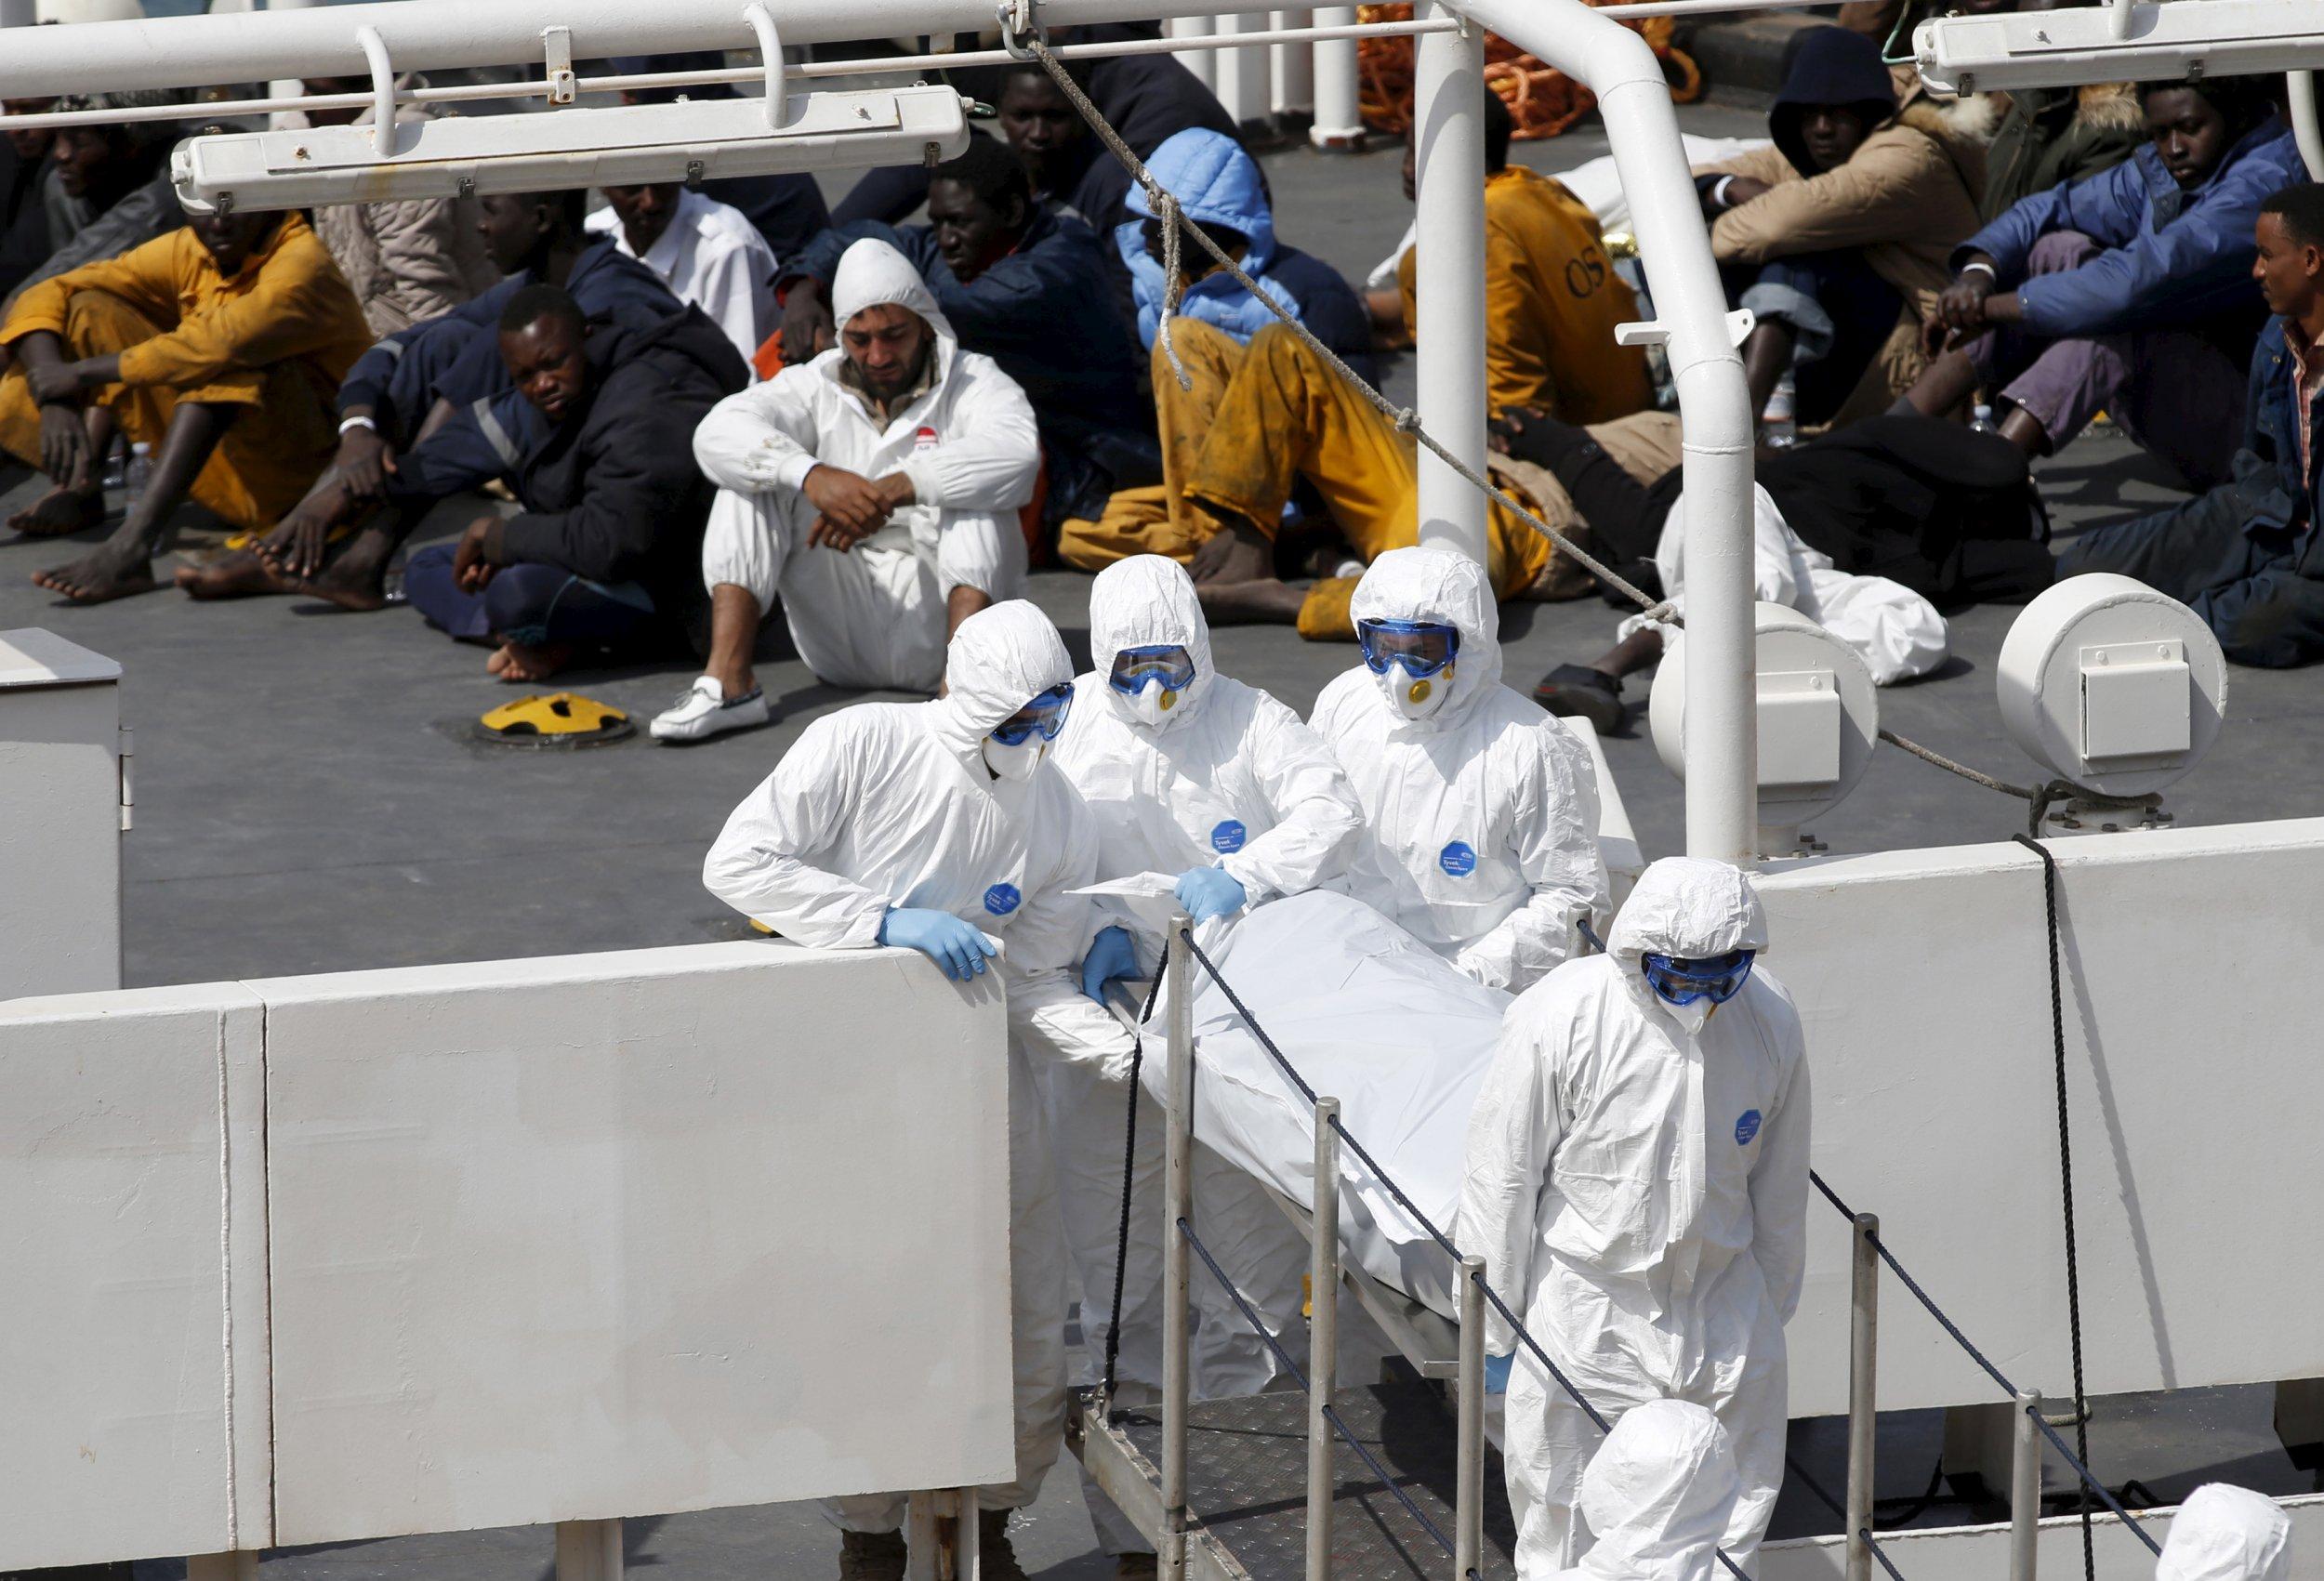 Malta surviving migrants